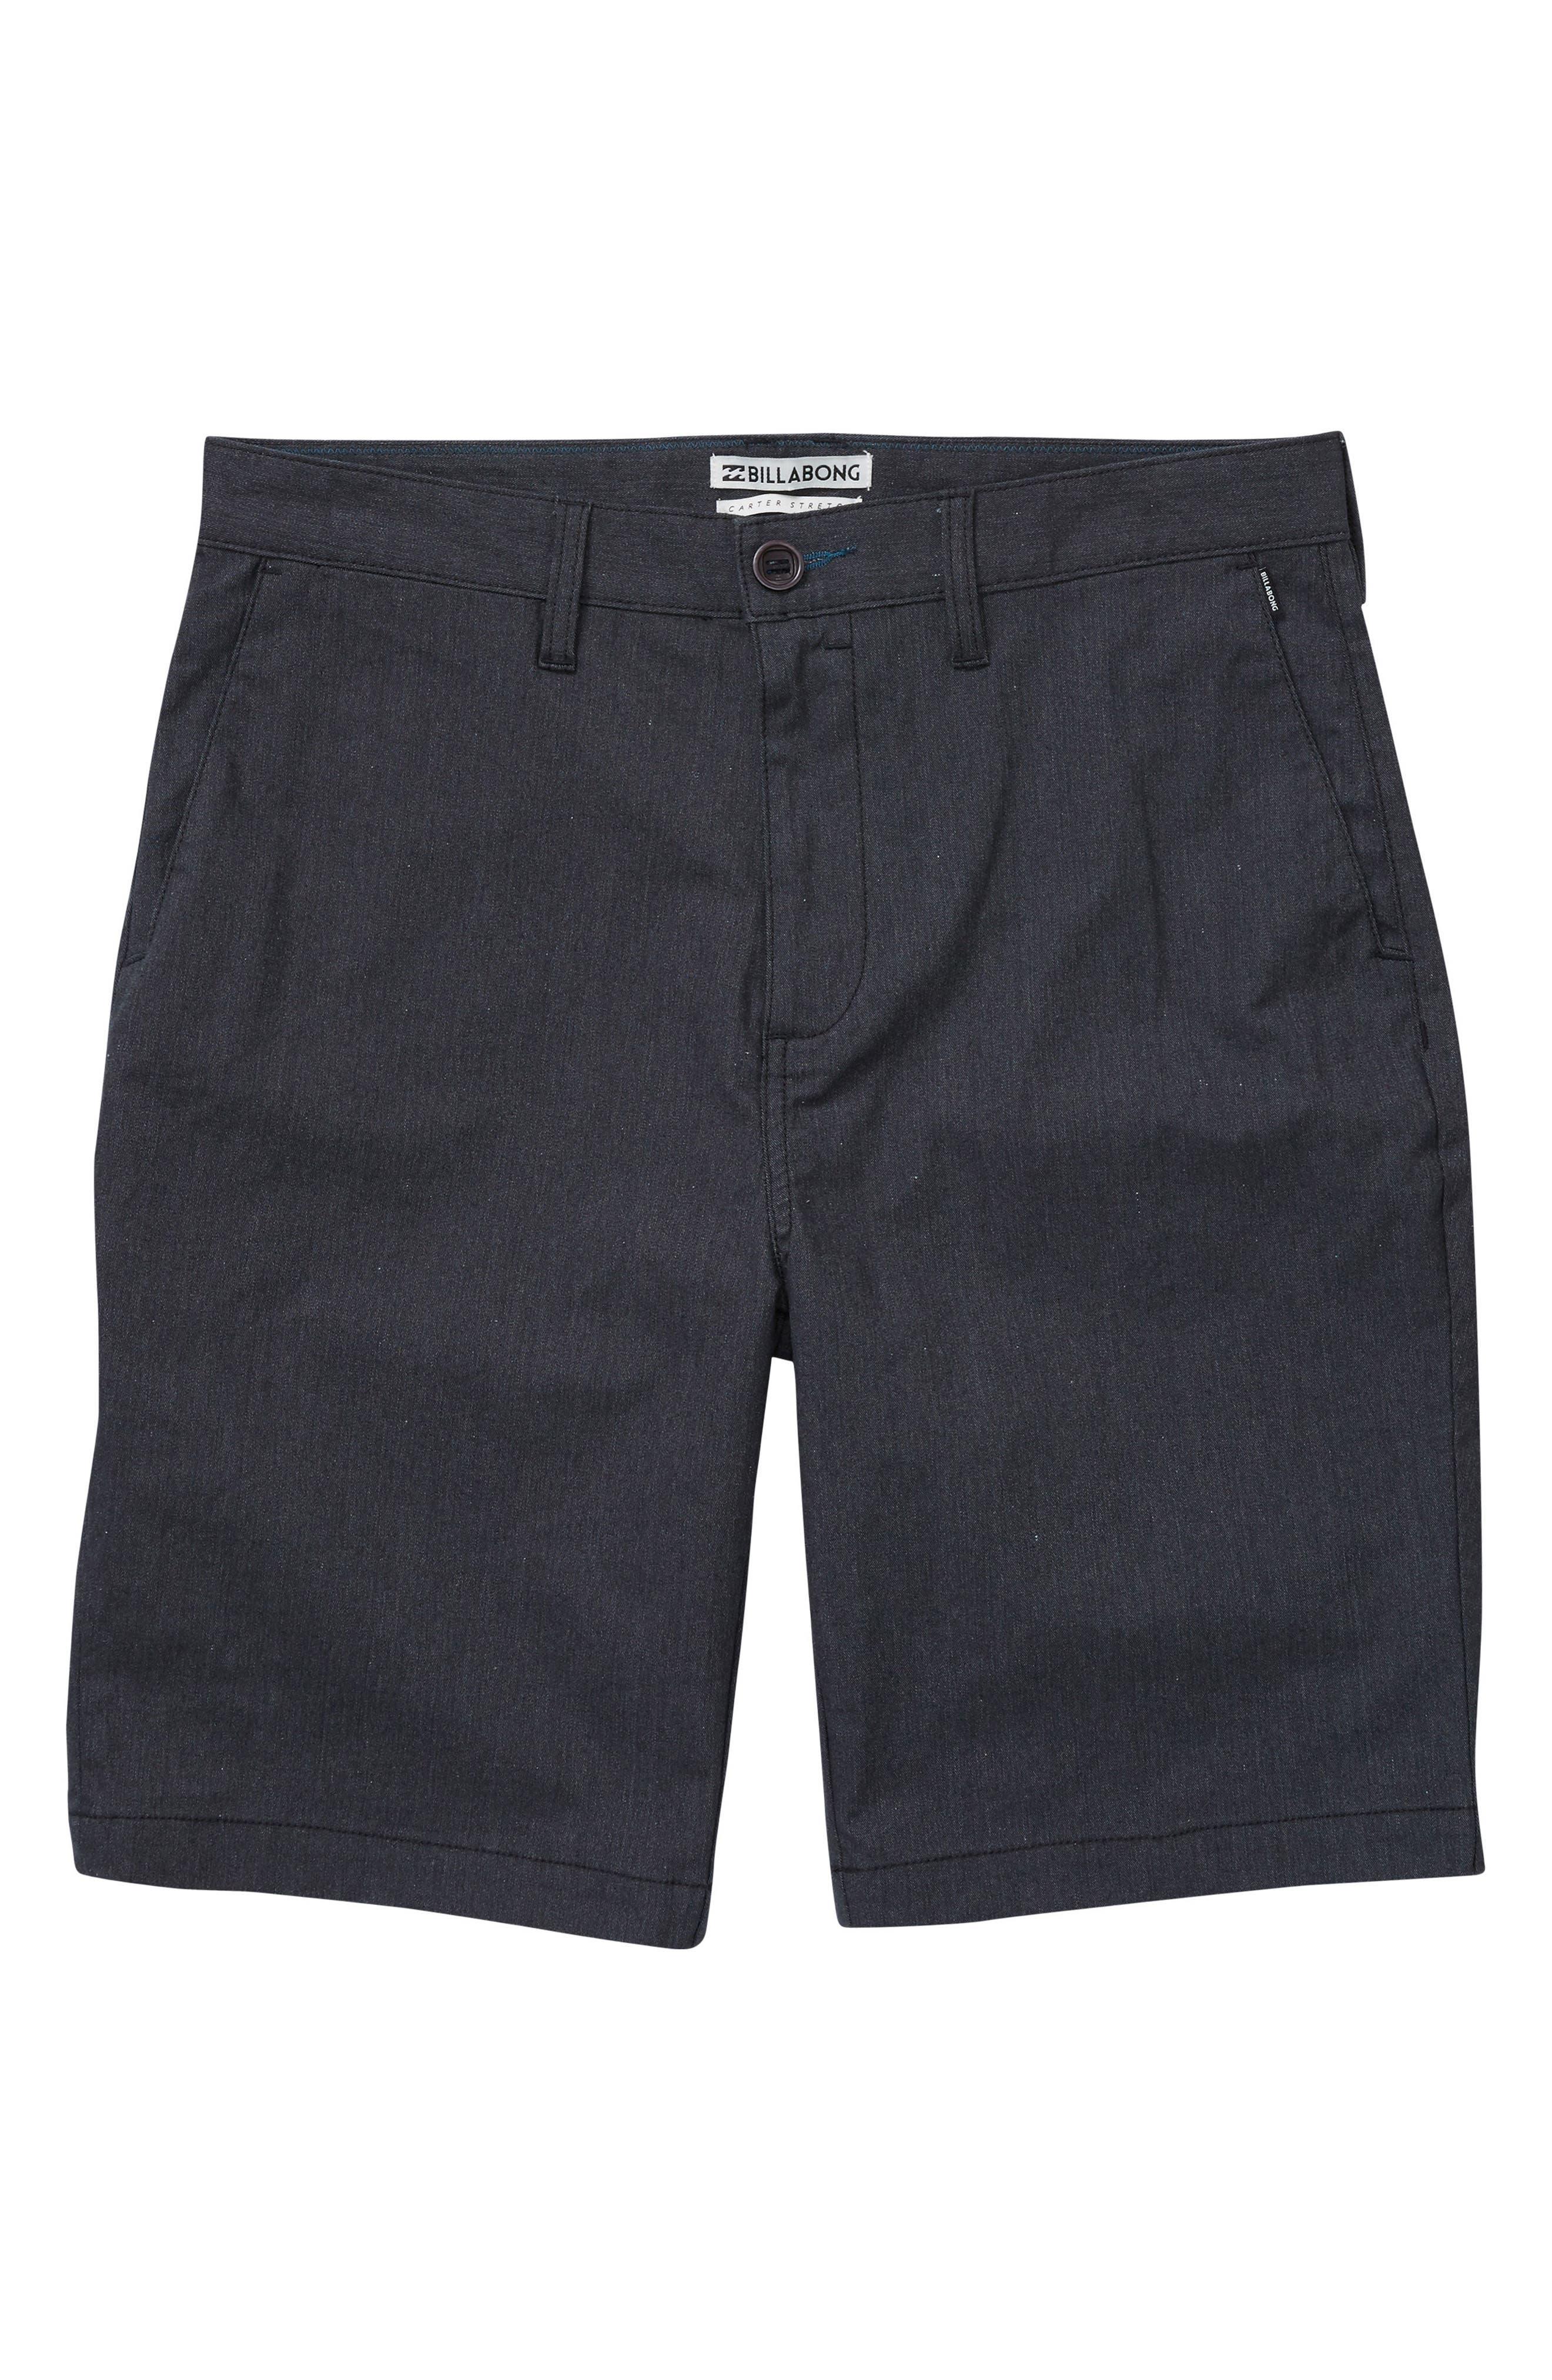 Carter Stretch Shorts,                         Main,                         color, 001